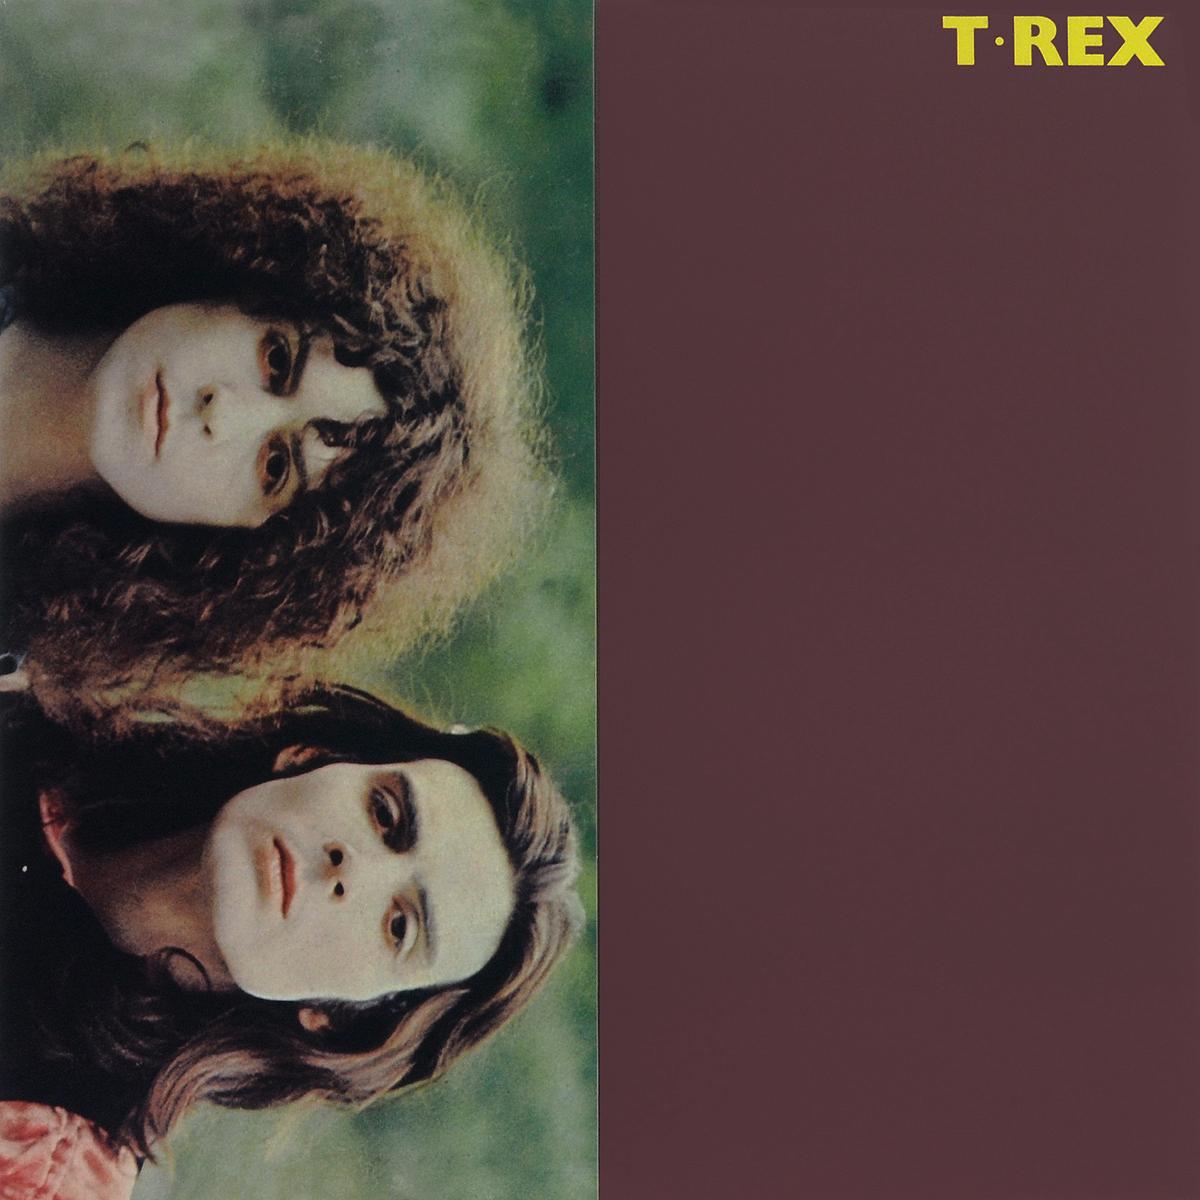 LP 1:Tracks 1 - 8LP 2:Tracks 9 - 15